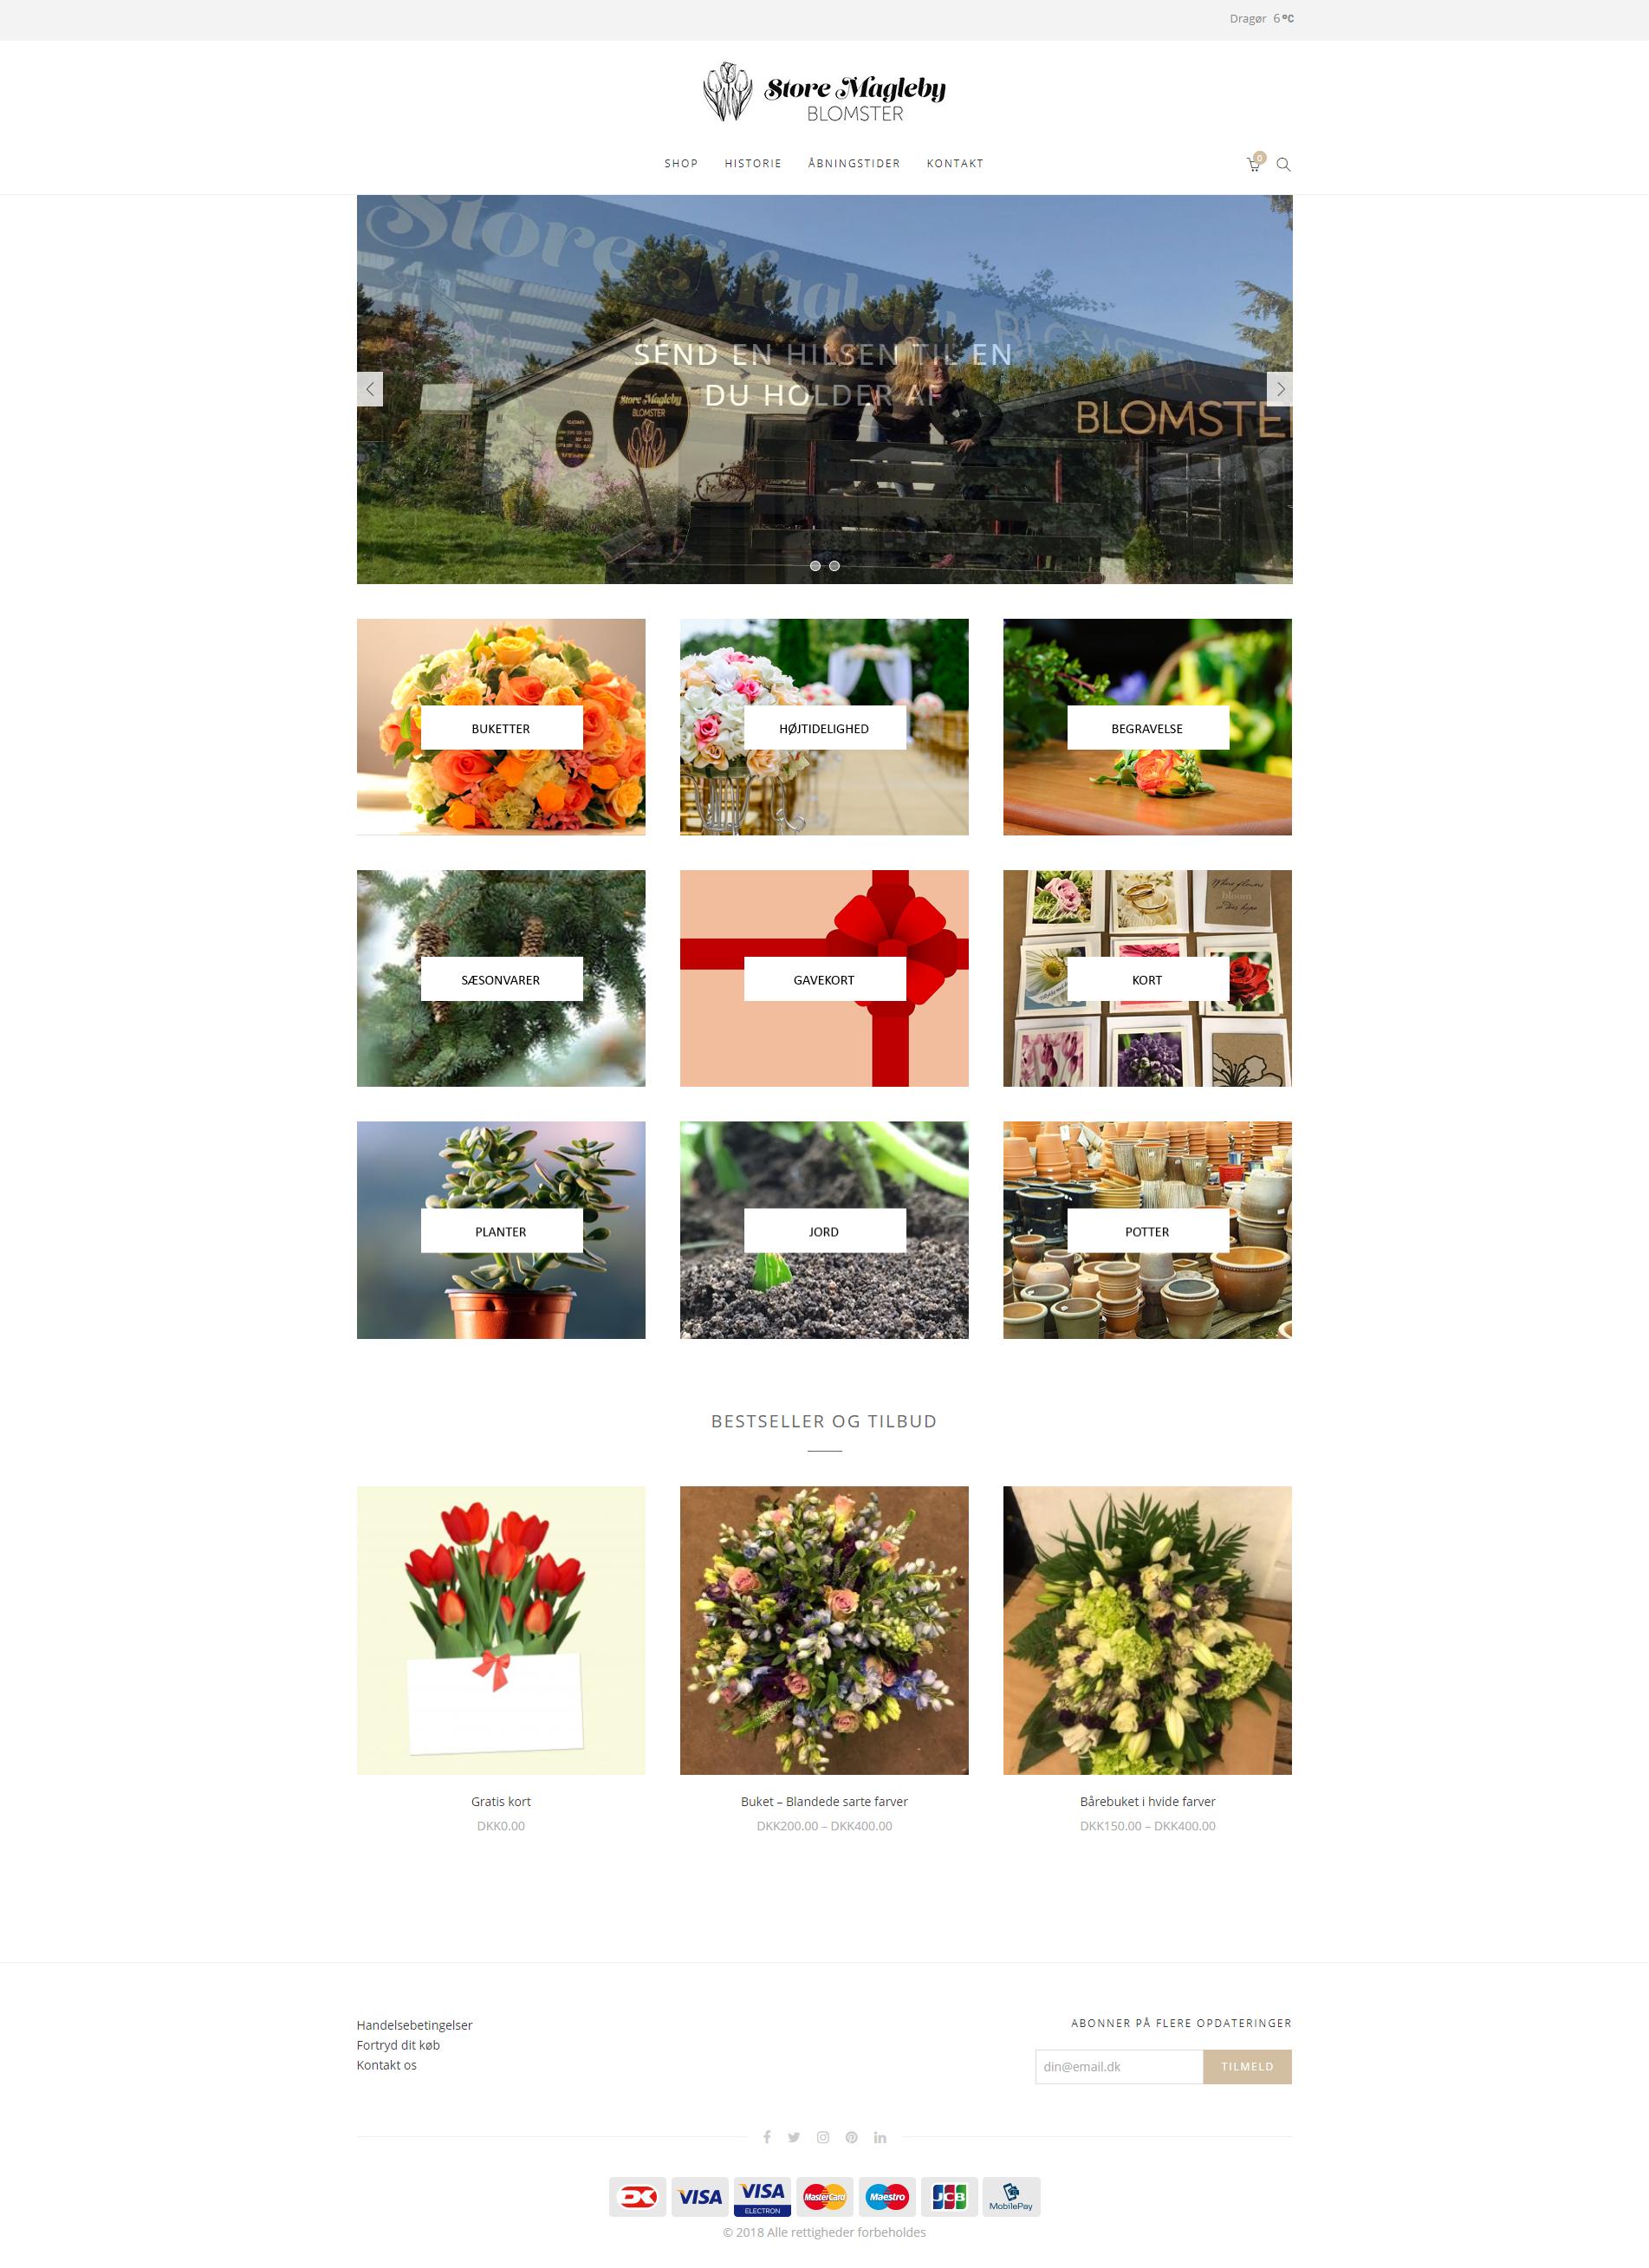 Digital-Agency-Latvia-Flower-Shop-Webdesign